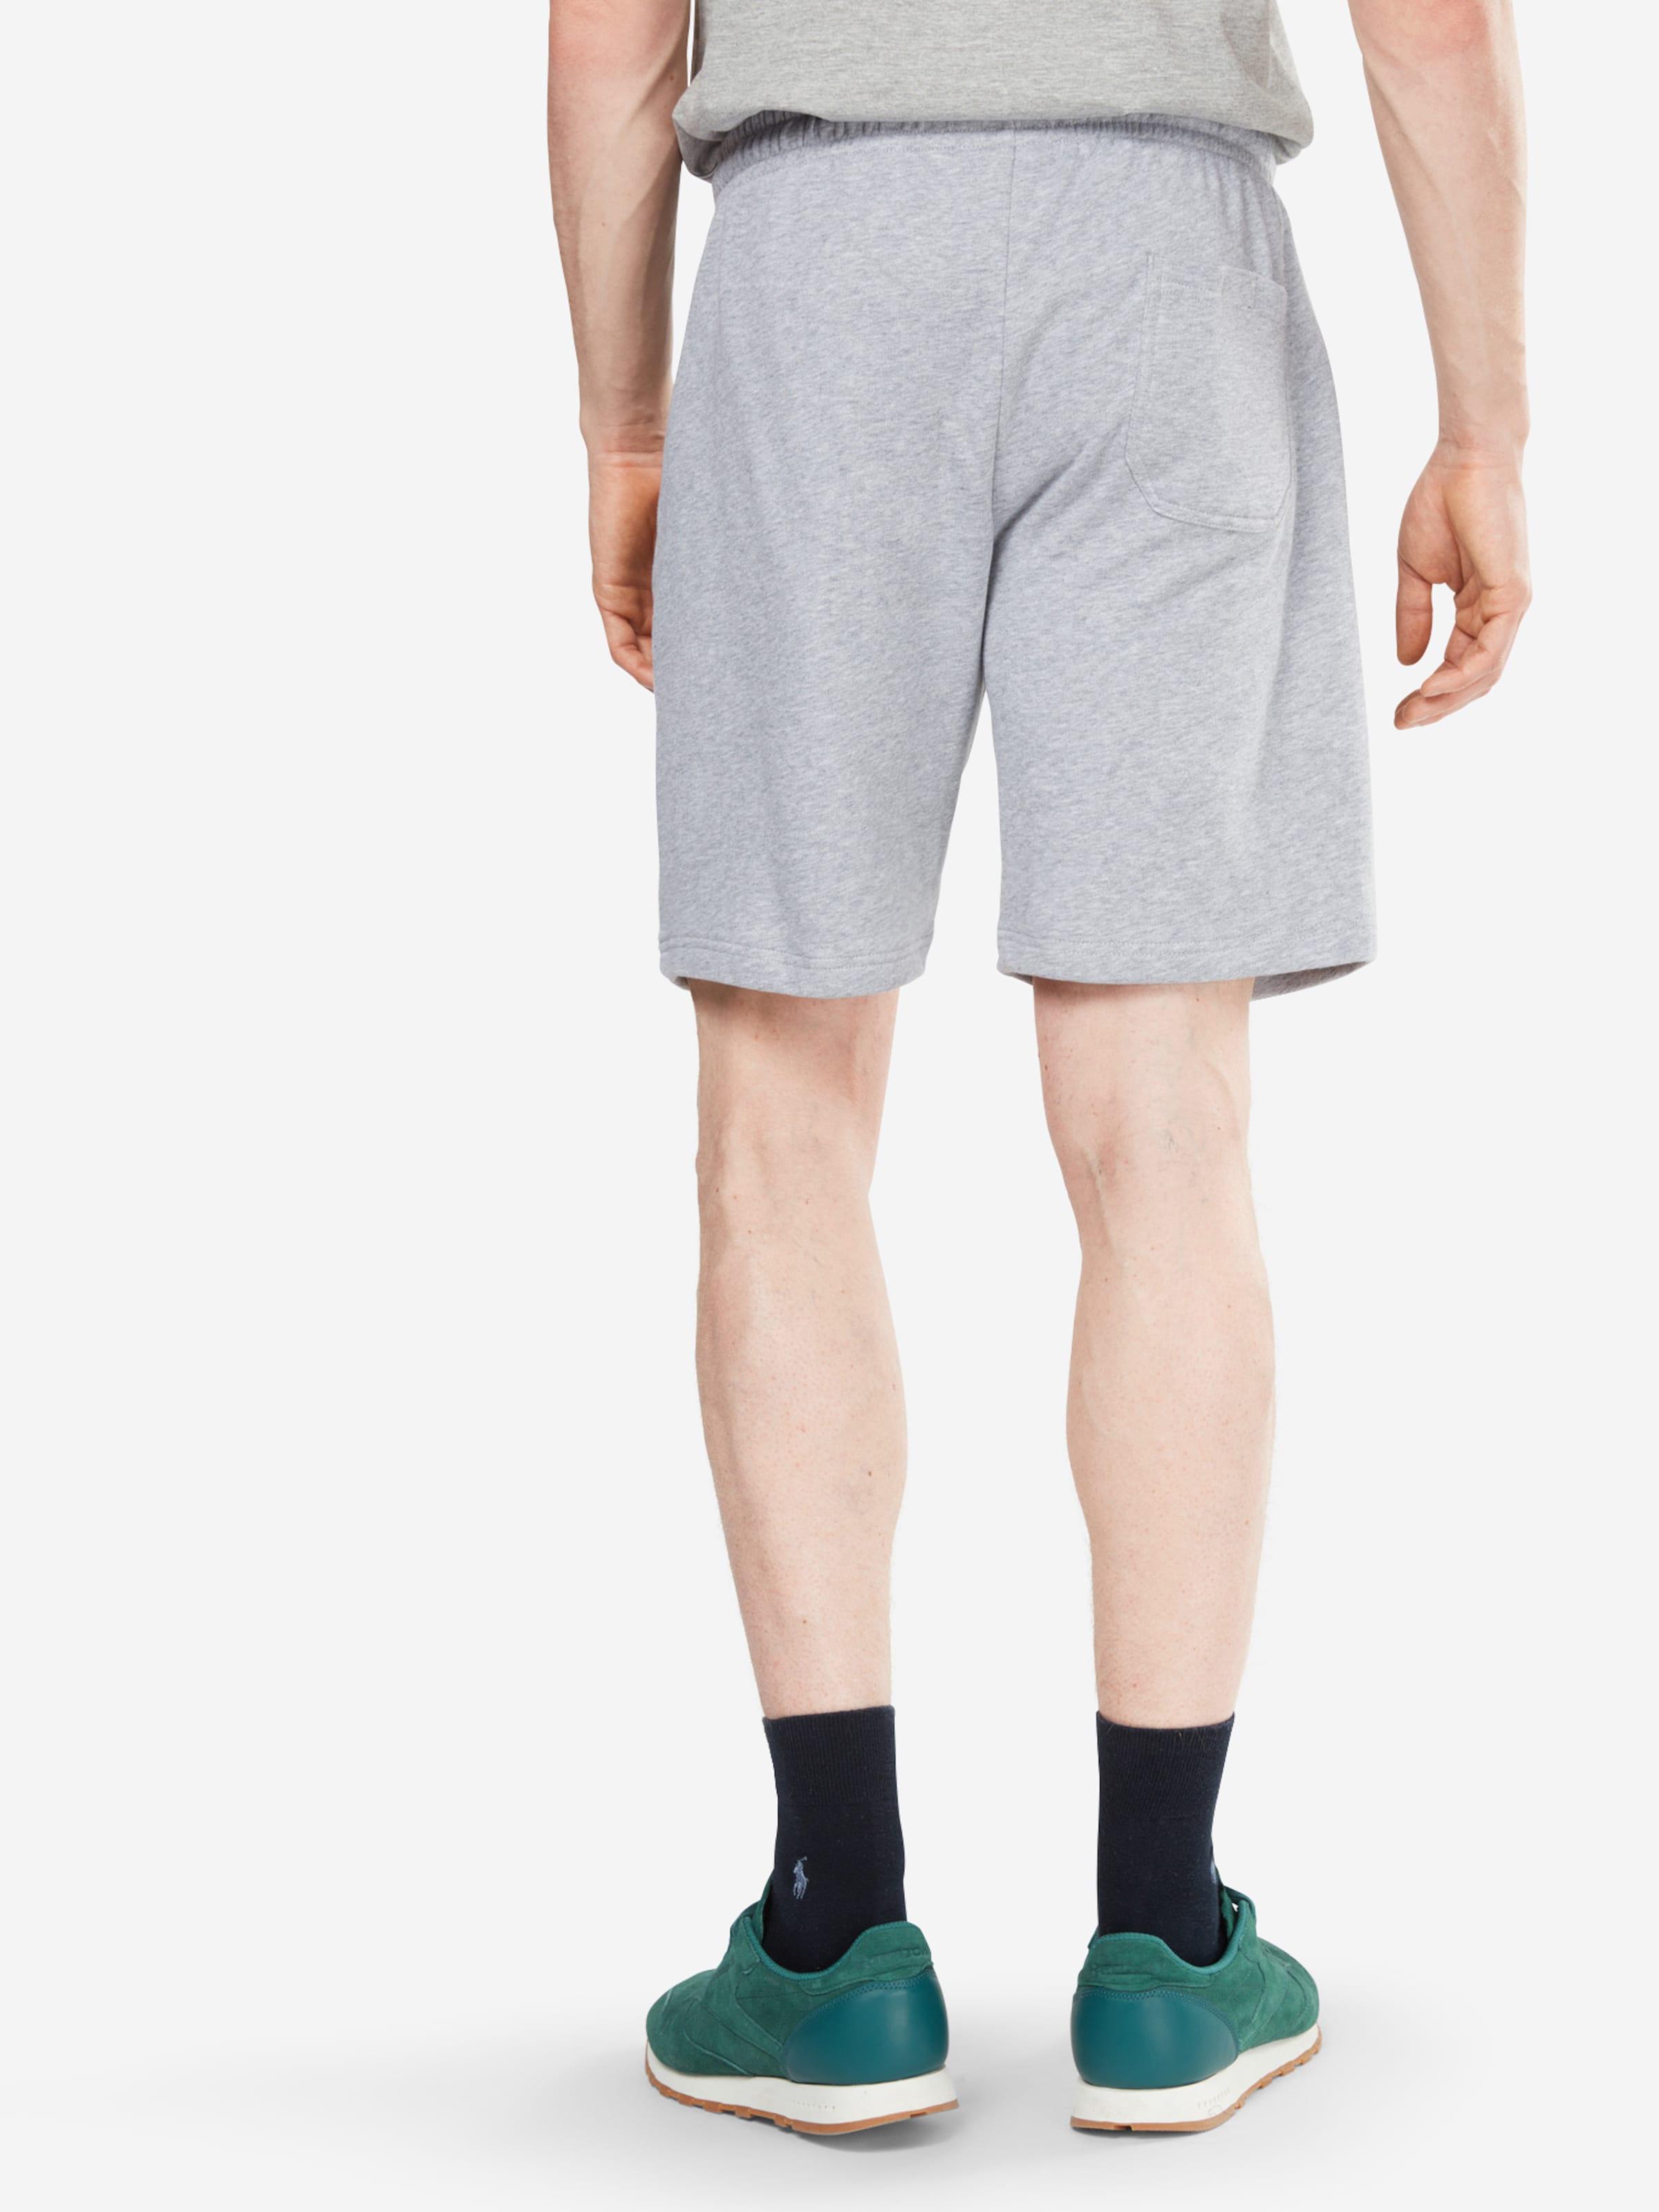 Shorts' Classics 'terry Sweatpants Urban Grau In 1cFKJl